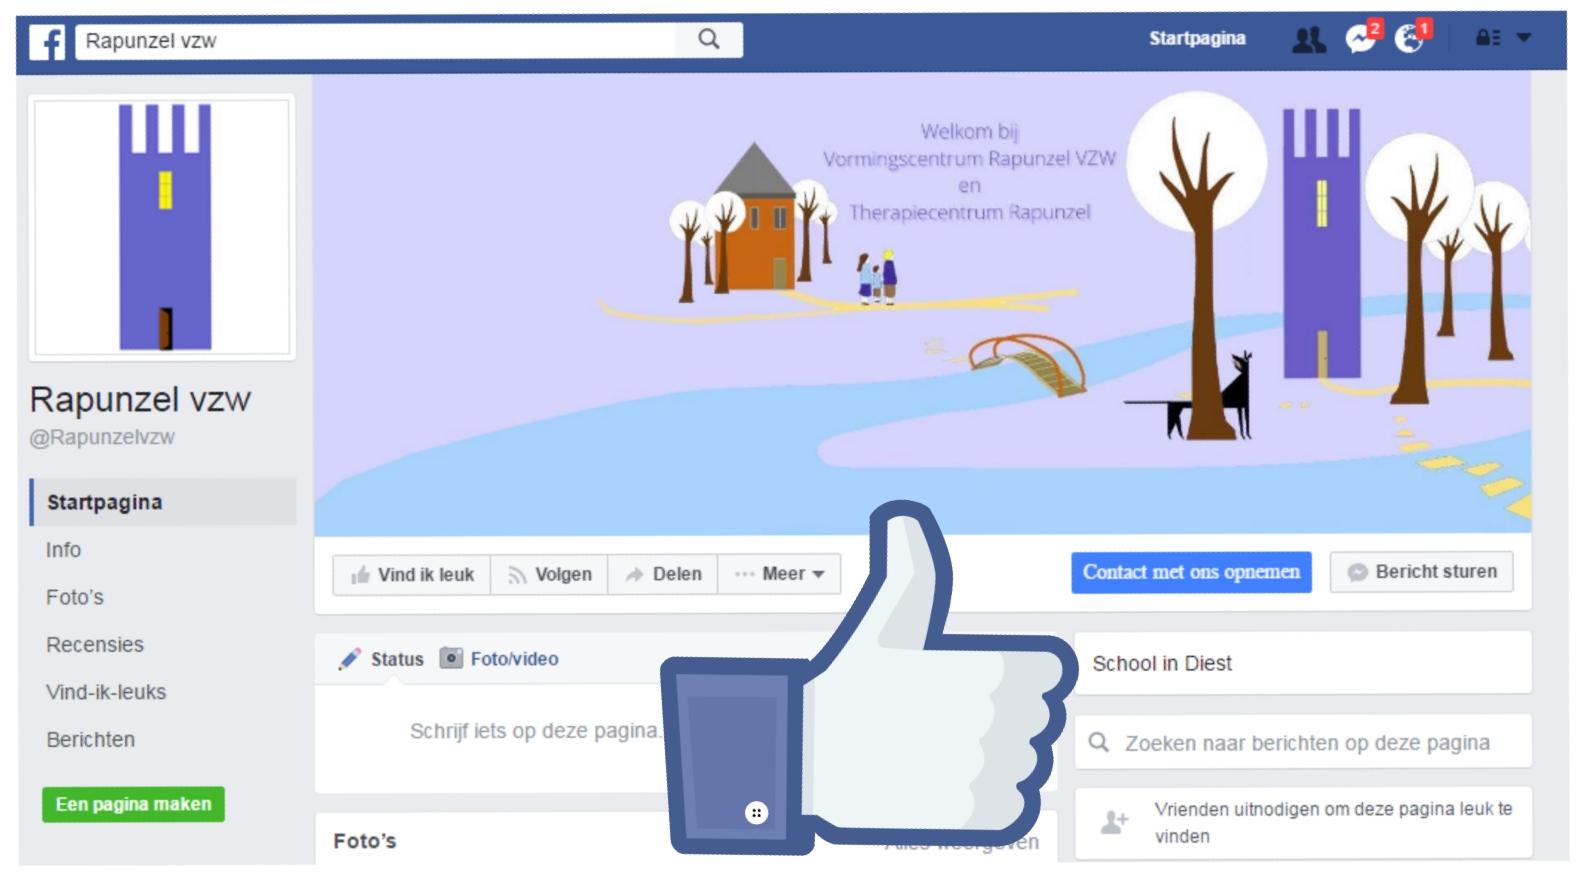 Facebookpagina Rapunzel